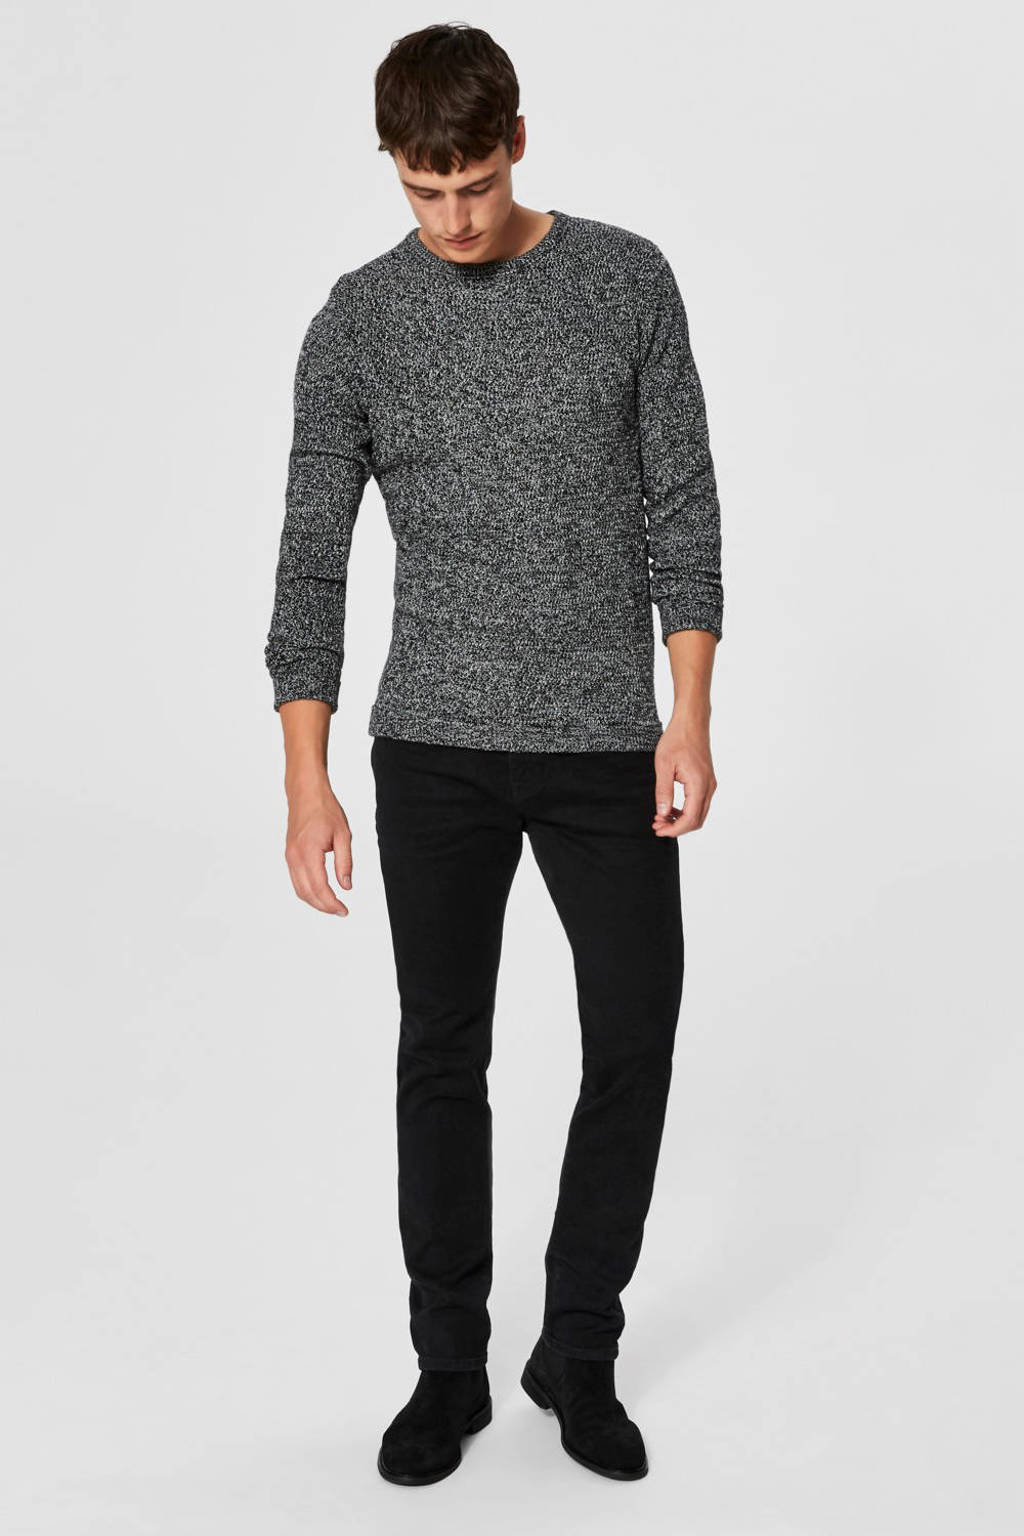 SELECTED HOMME melange trui, Zwart/wit